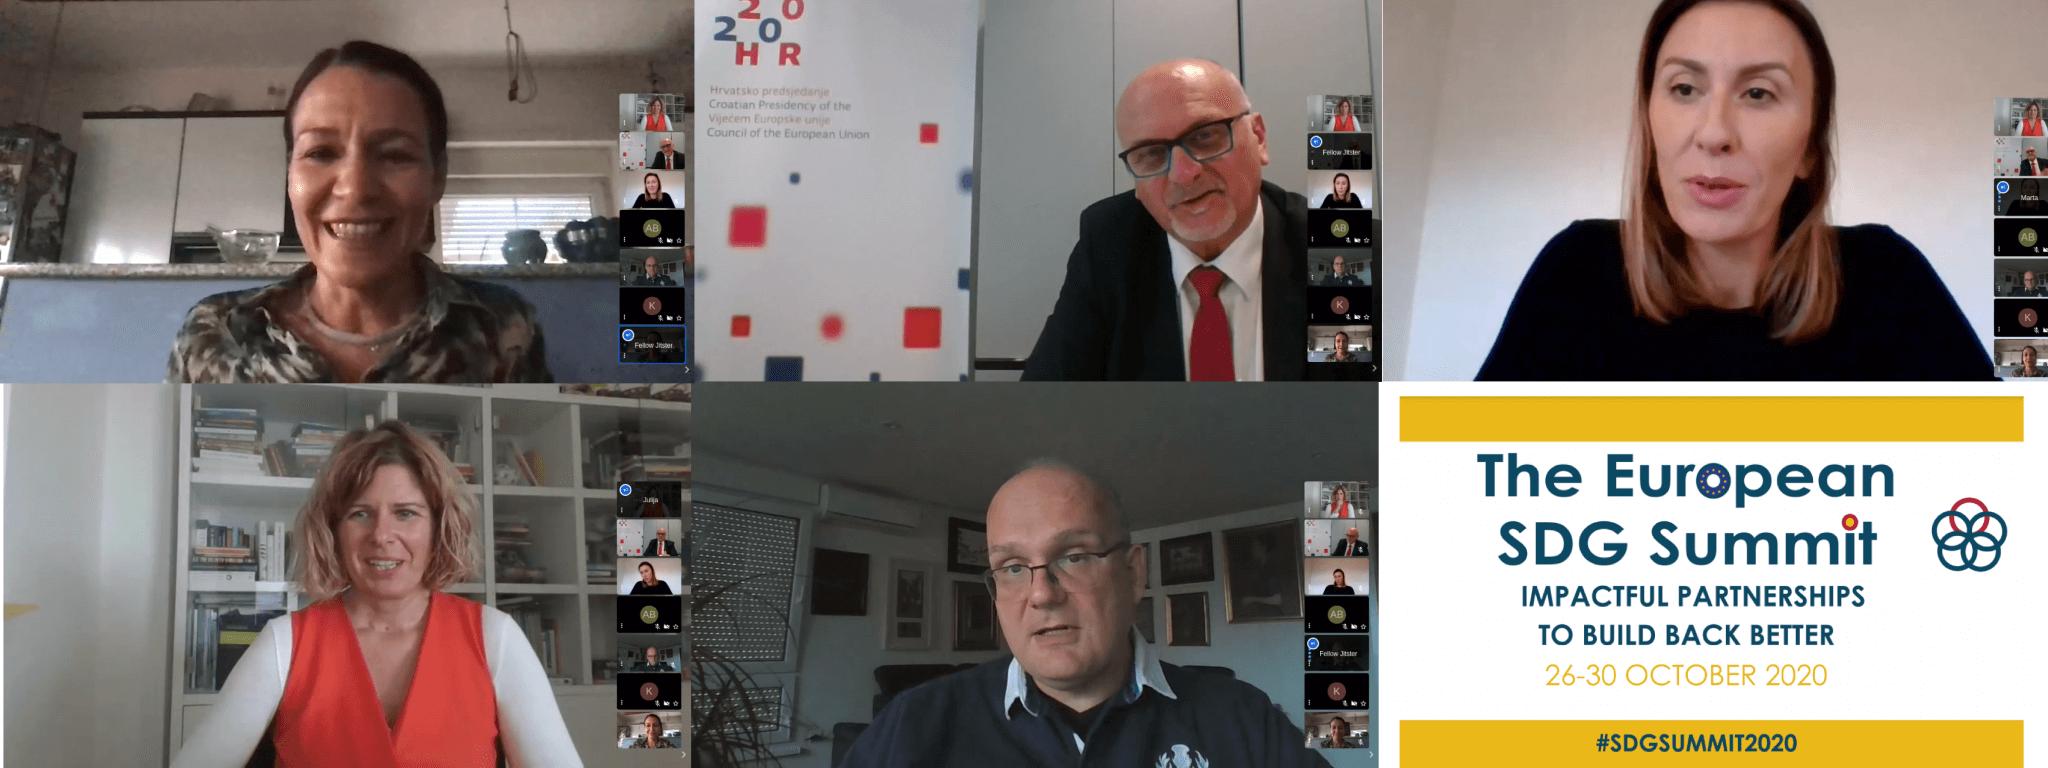 "Održan prvi okrugli stol SDG Samita u organizaciji HR PSOR-a pod nazivom ""Zelena javna nabava"" 1 - hrpsor Hrvatski poslovni savjet za održivi razvoj"